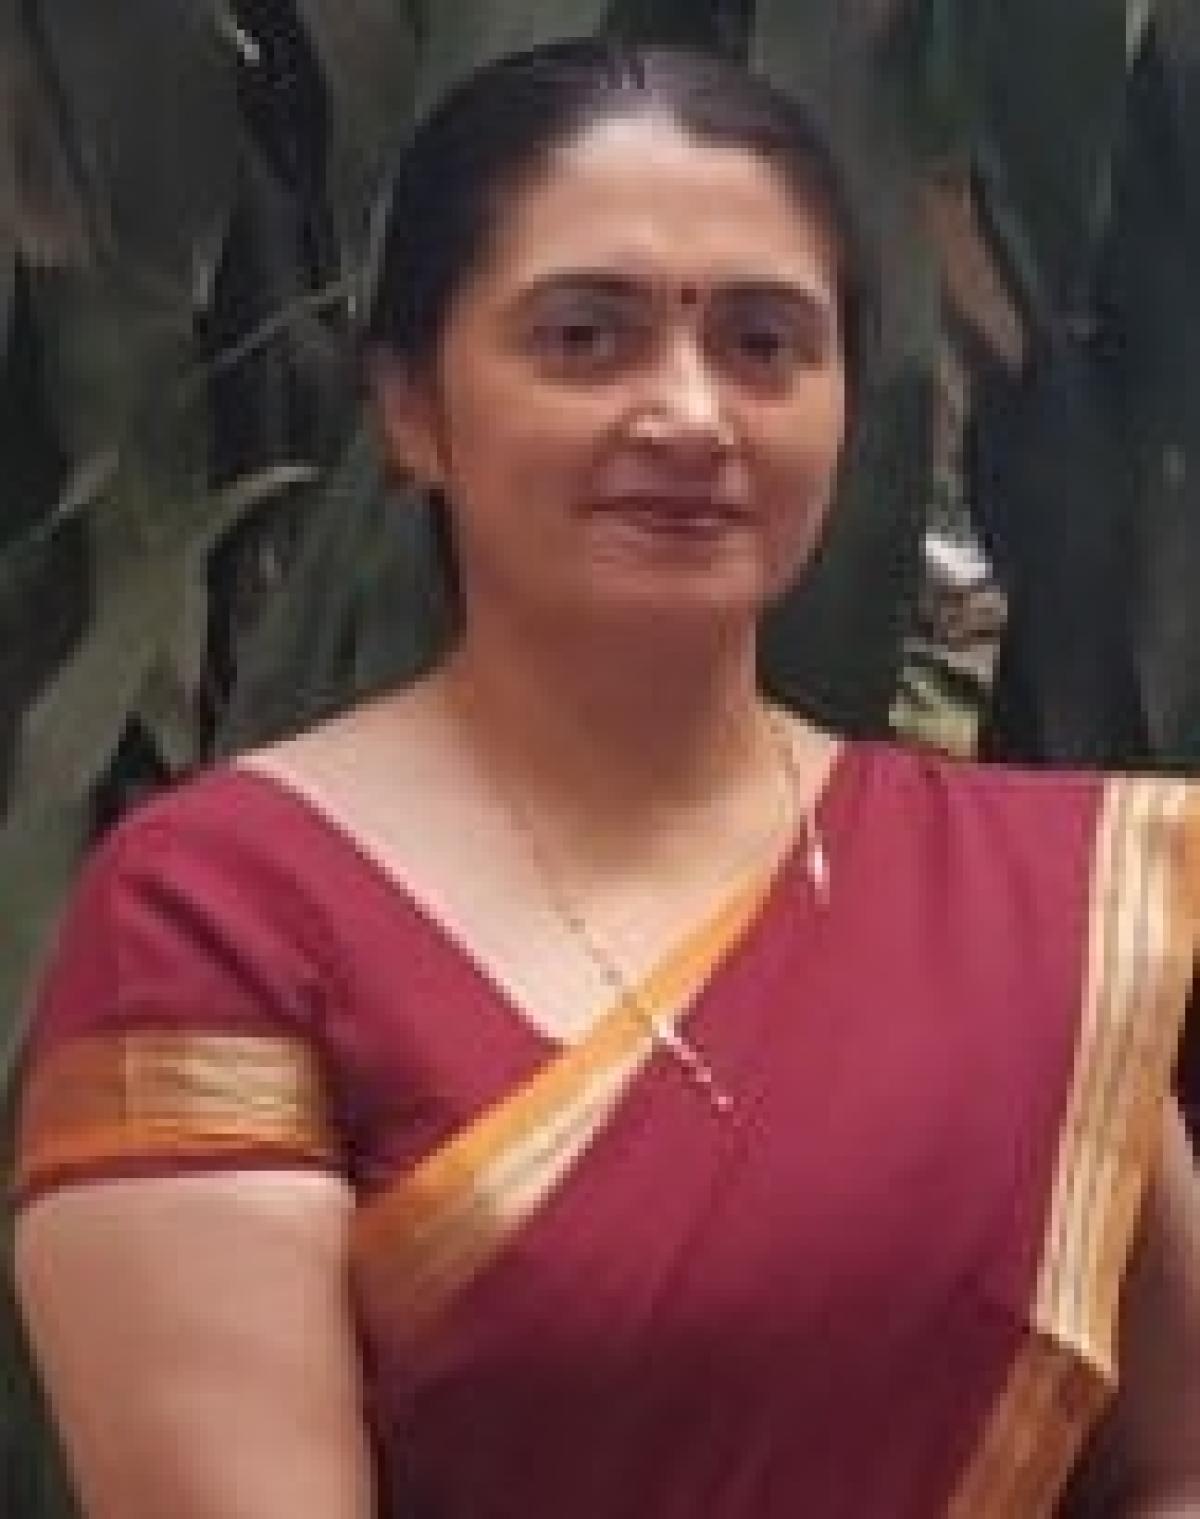 Kuldeep Kaur Chhabra